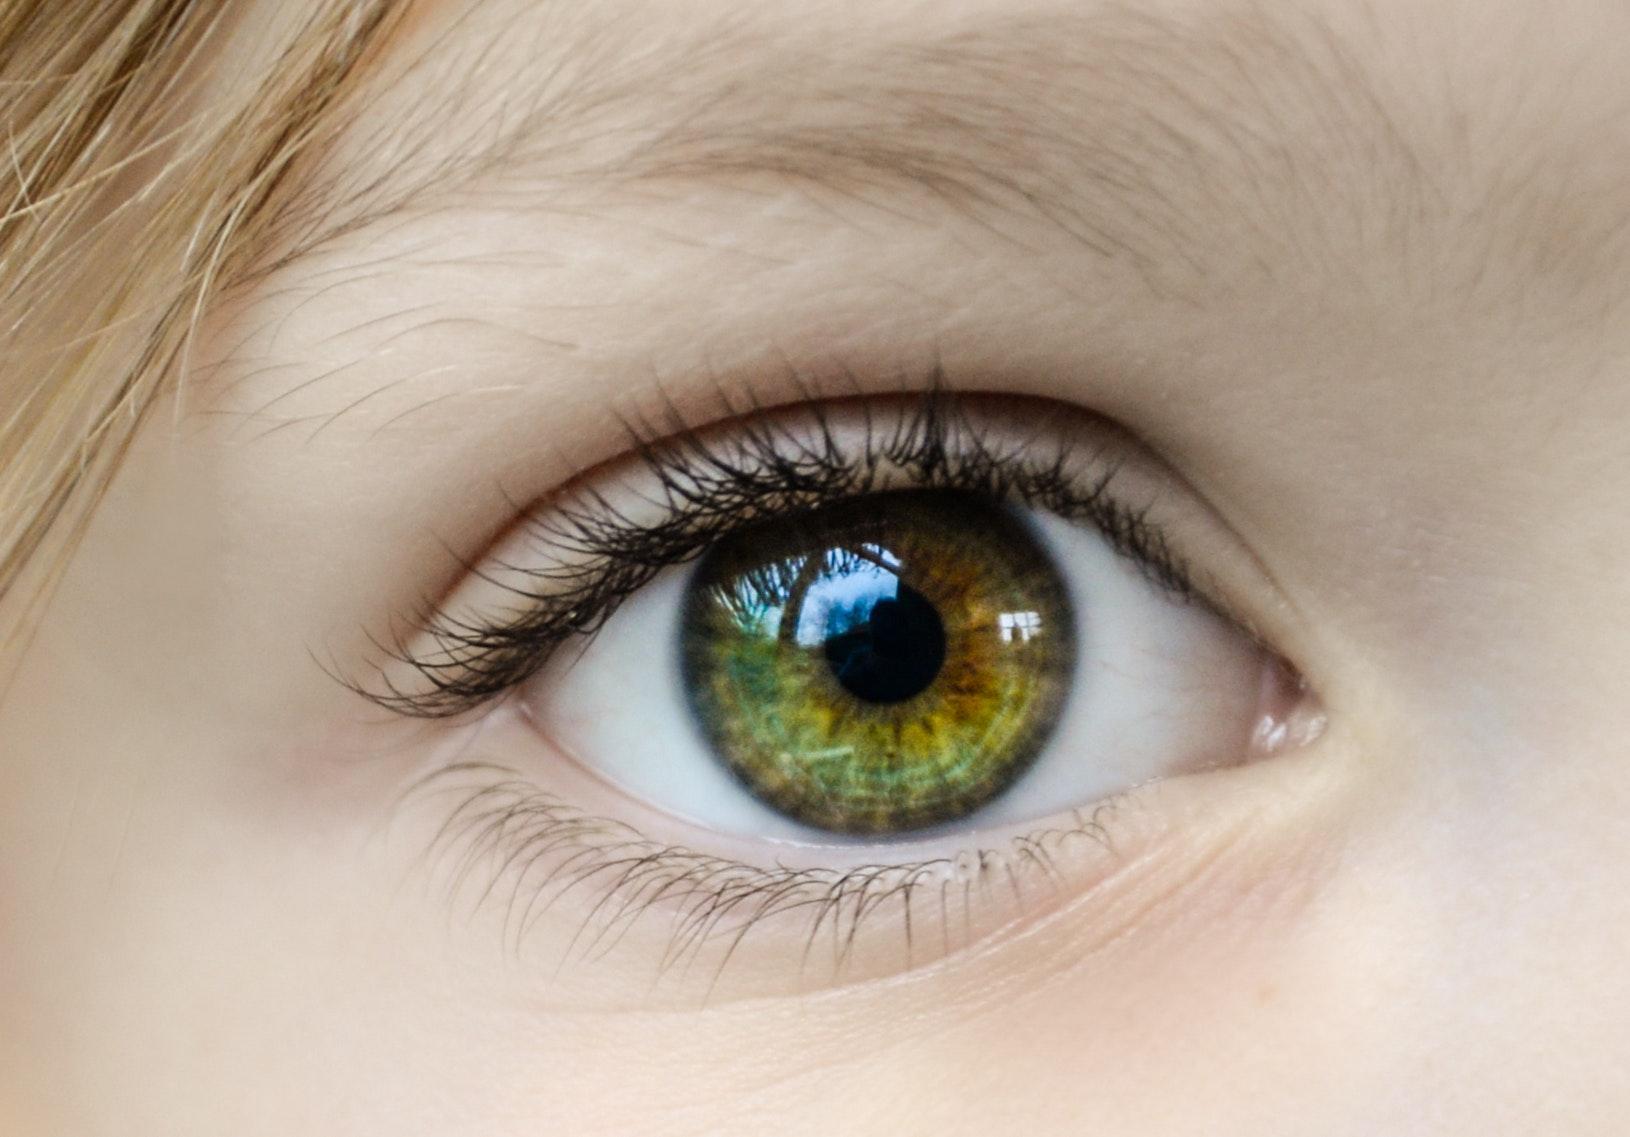 close-up-eye-eyeball-862122